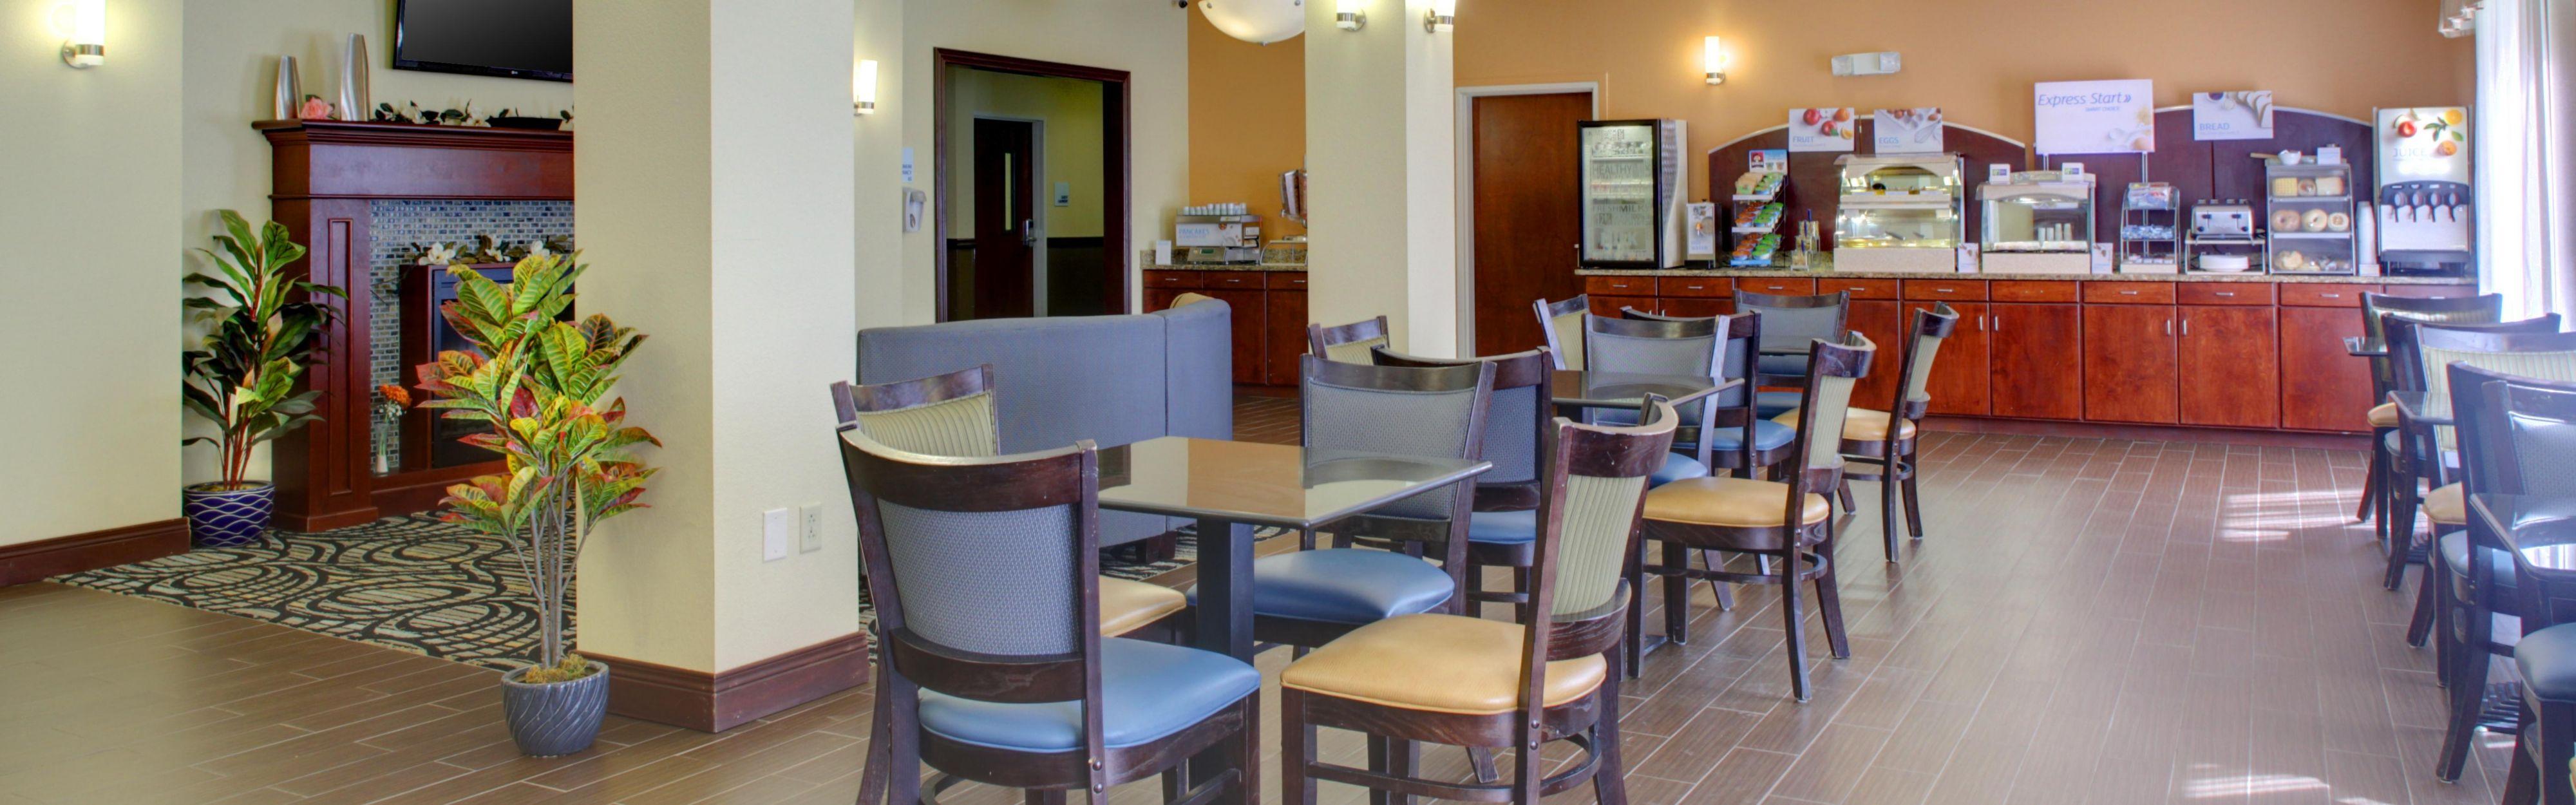 Holiday Inn Express & Suites Charleston NW - Cross Lanes image 2